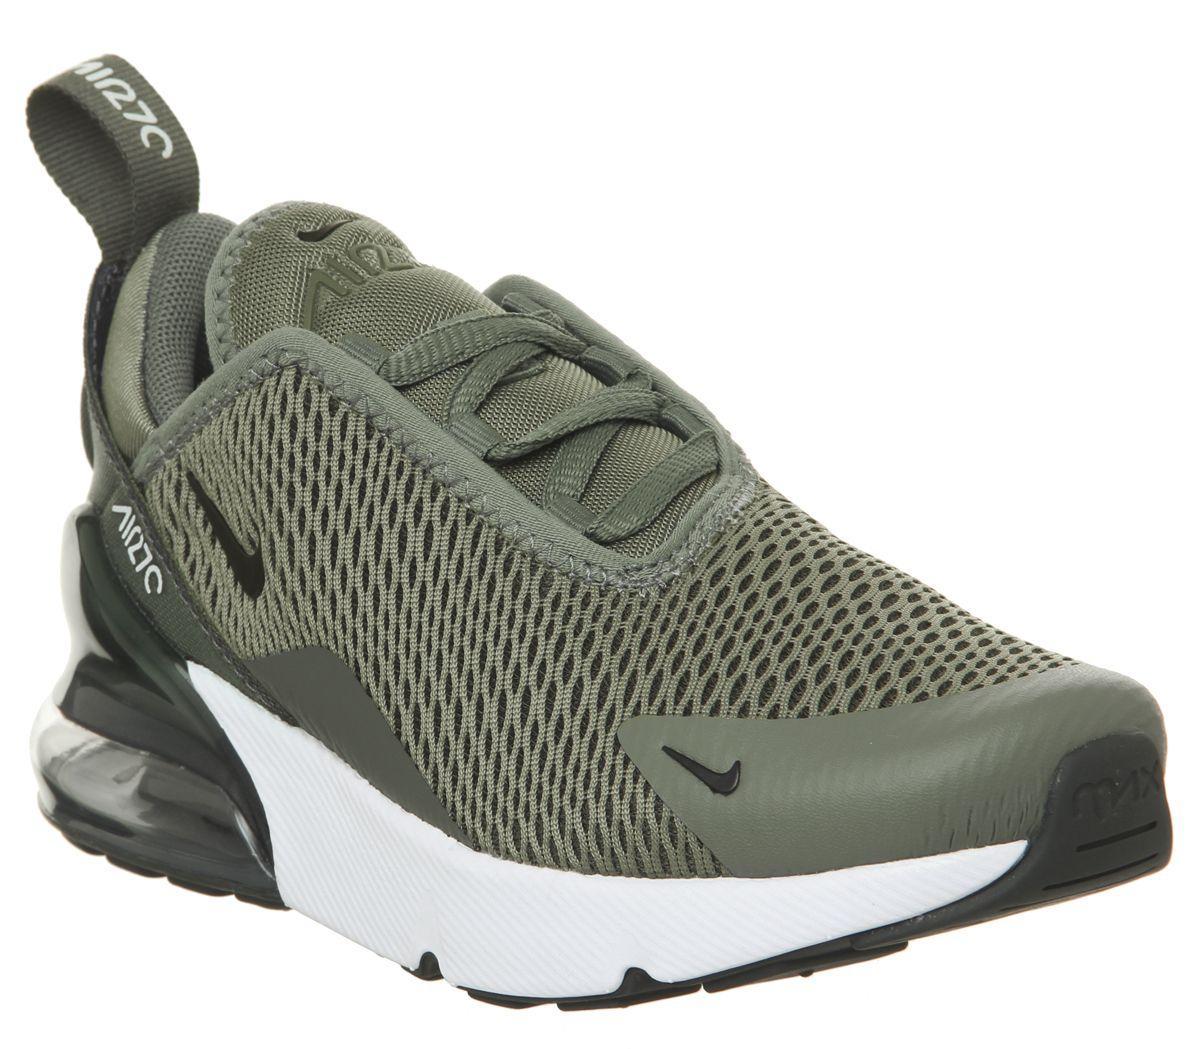 8301a9c83f2 Nike - Green Air Max 270 Ps Trainers - Lyst. View fullscreen